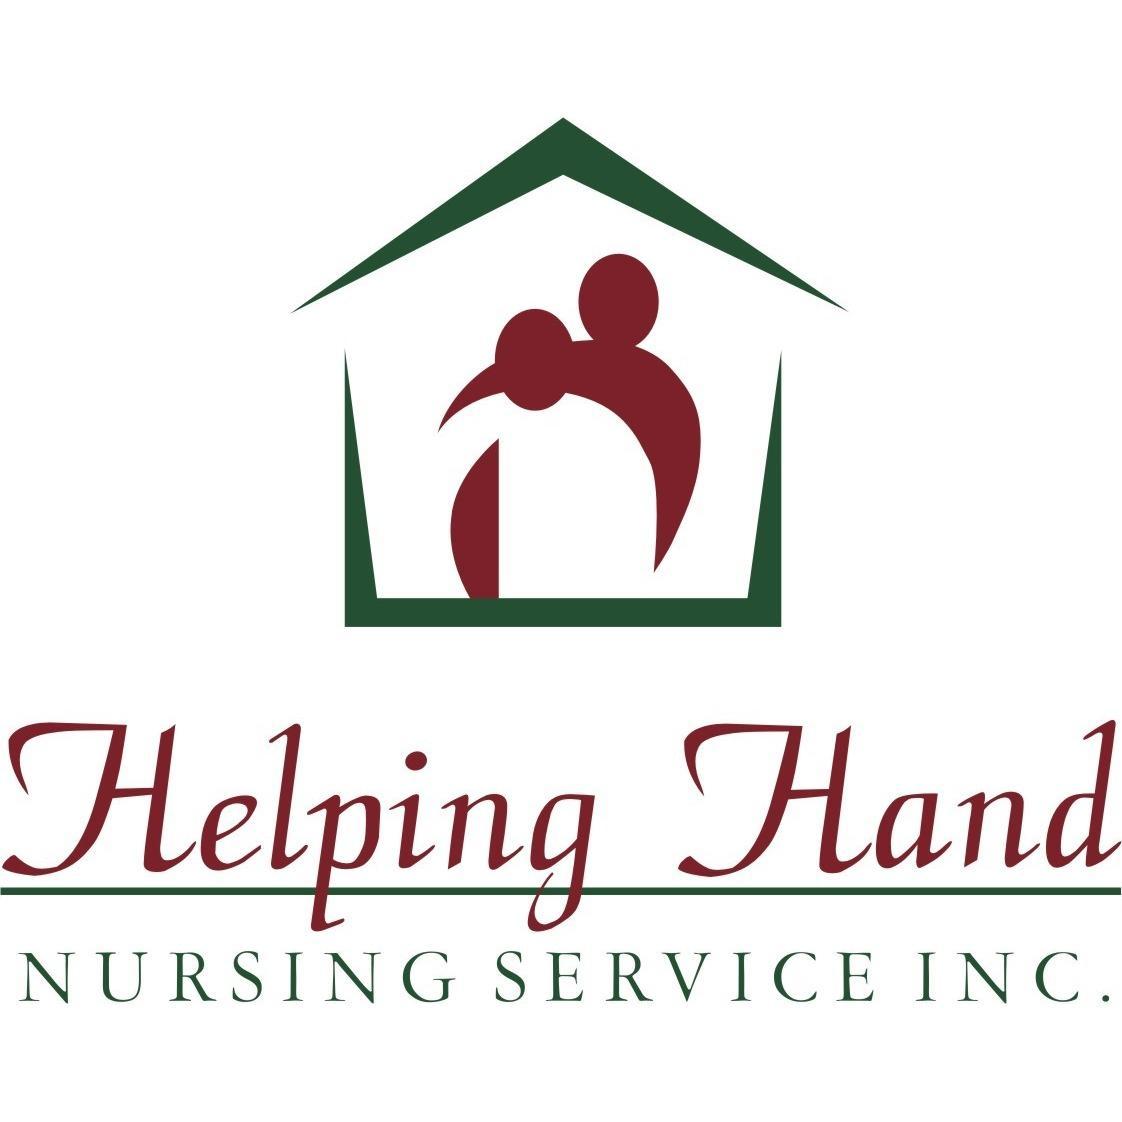 Helping Hand Nursing Service, Inc.